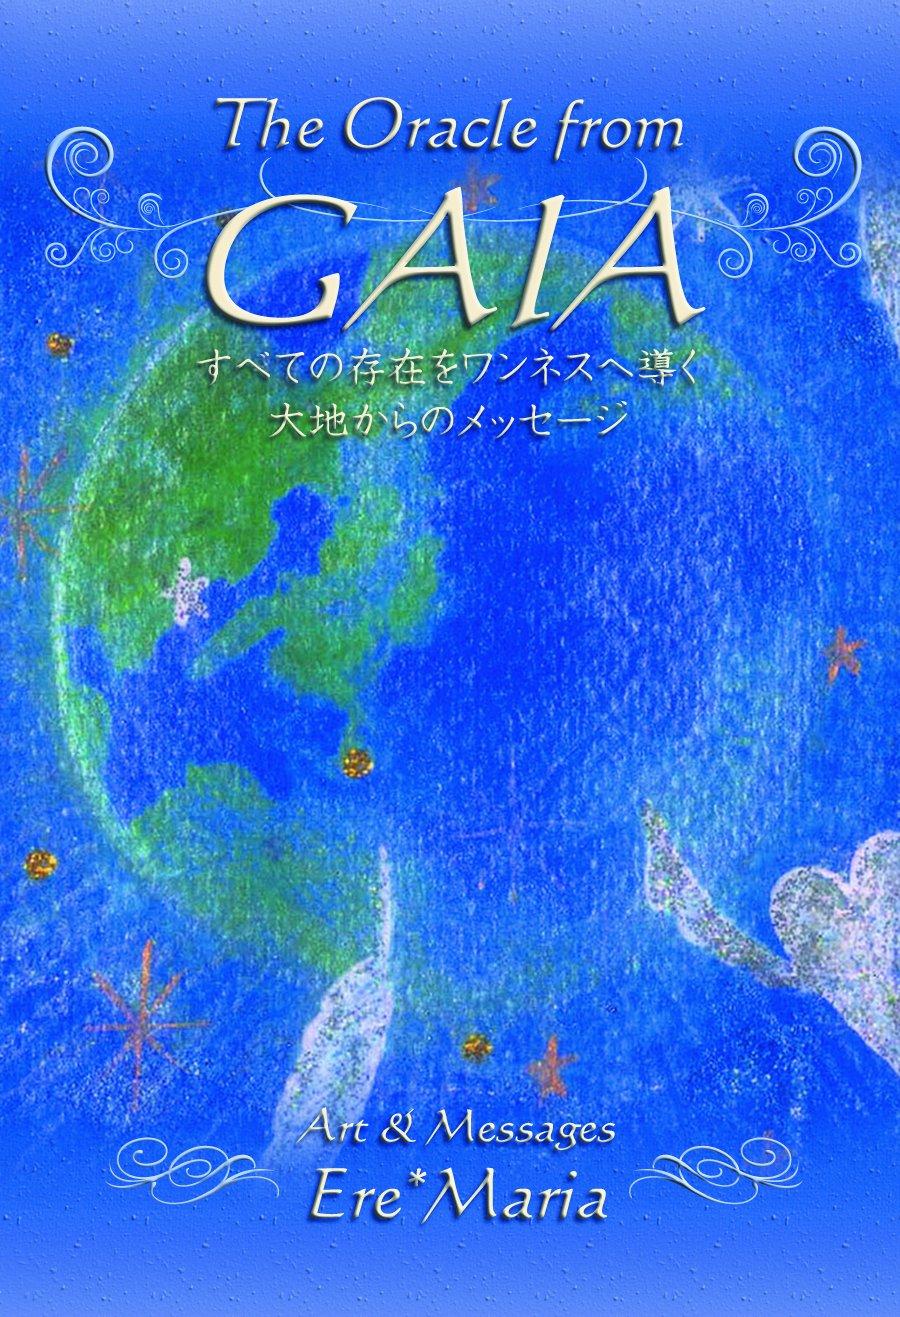 the oracle from gaia ガイアオラクルカード エレマリア 本 通販